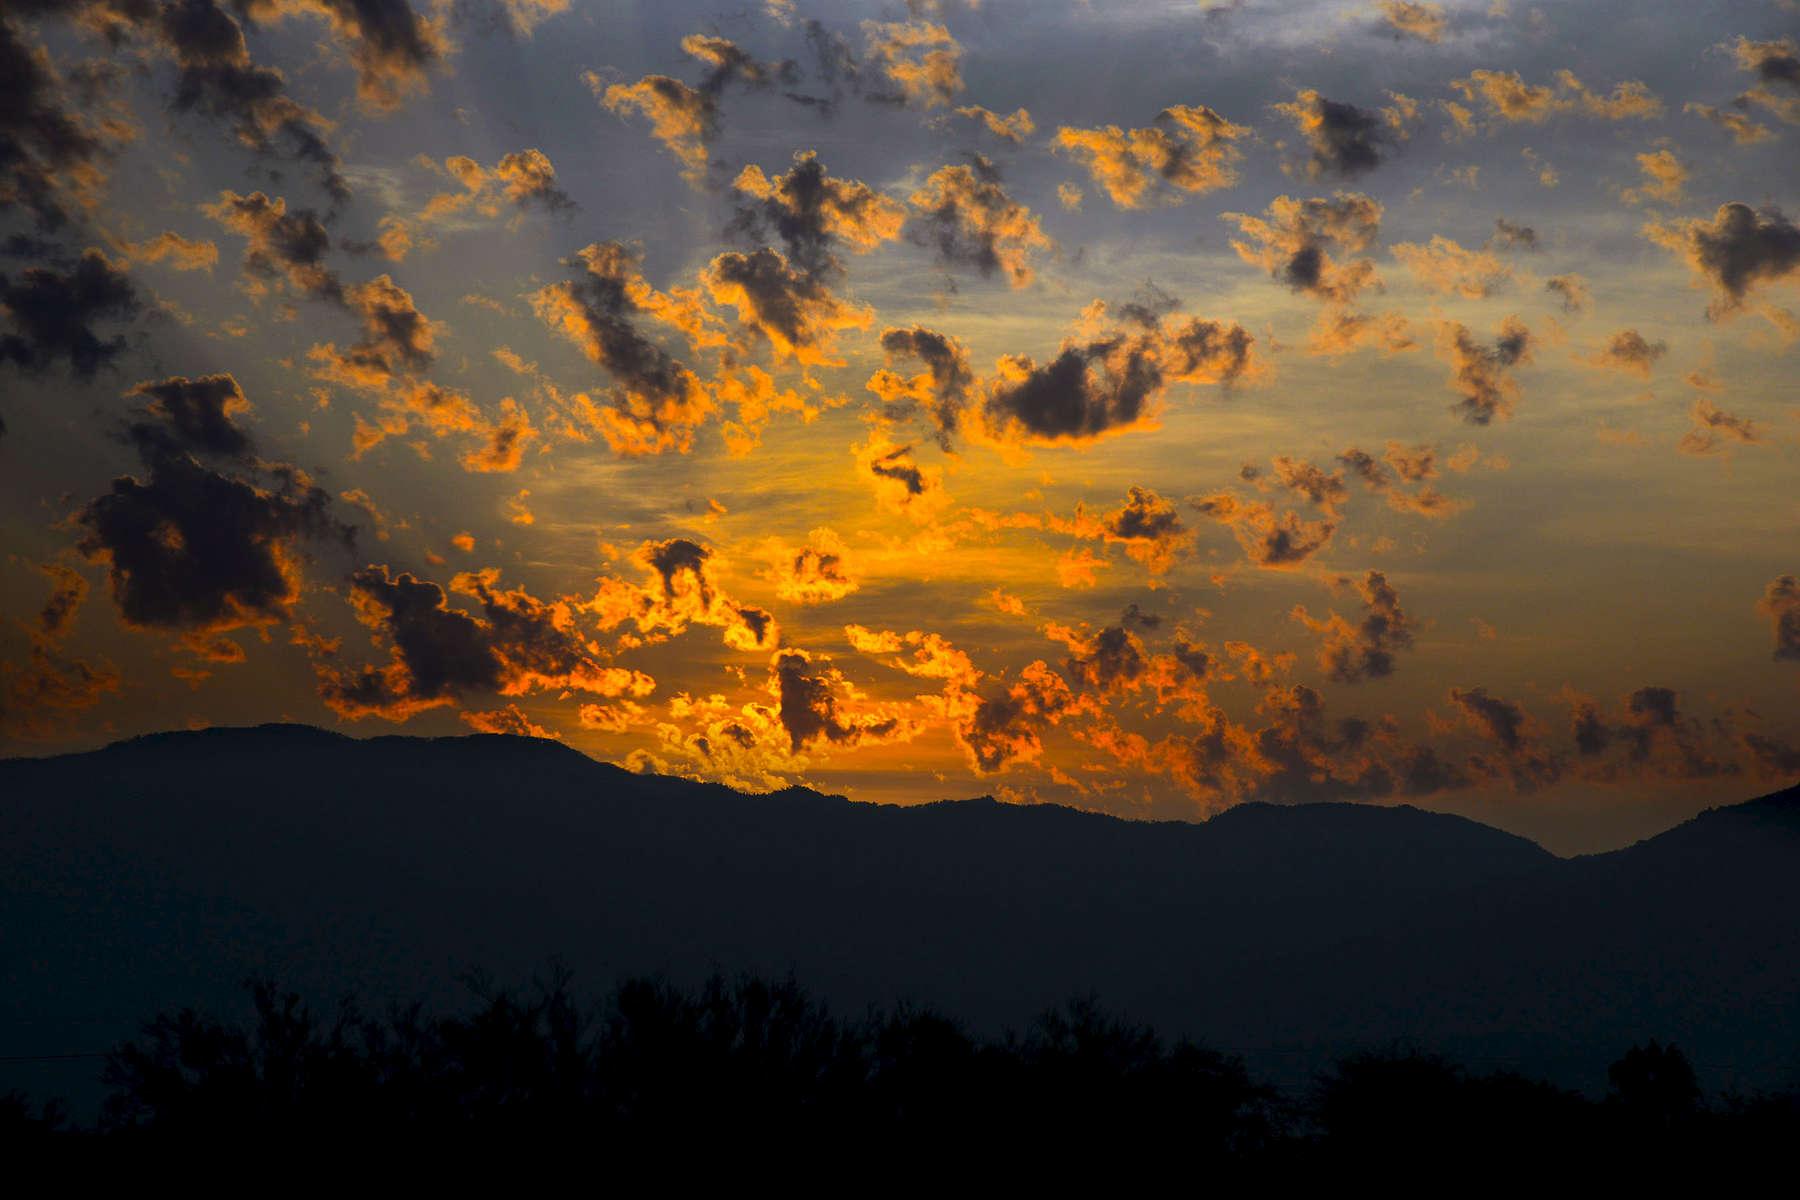 Catalina-sunrise-Final2-copy